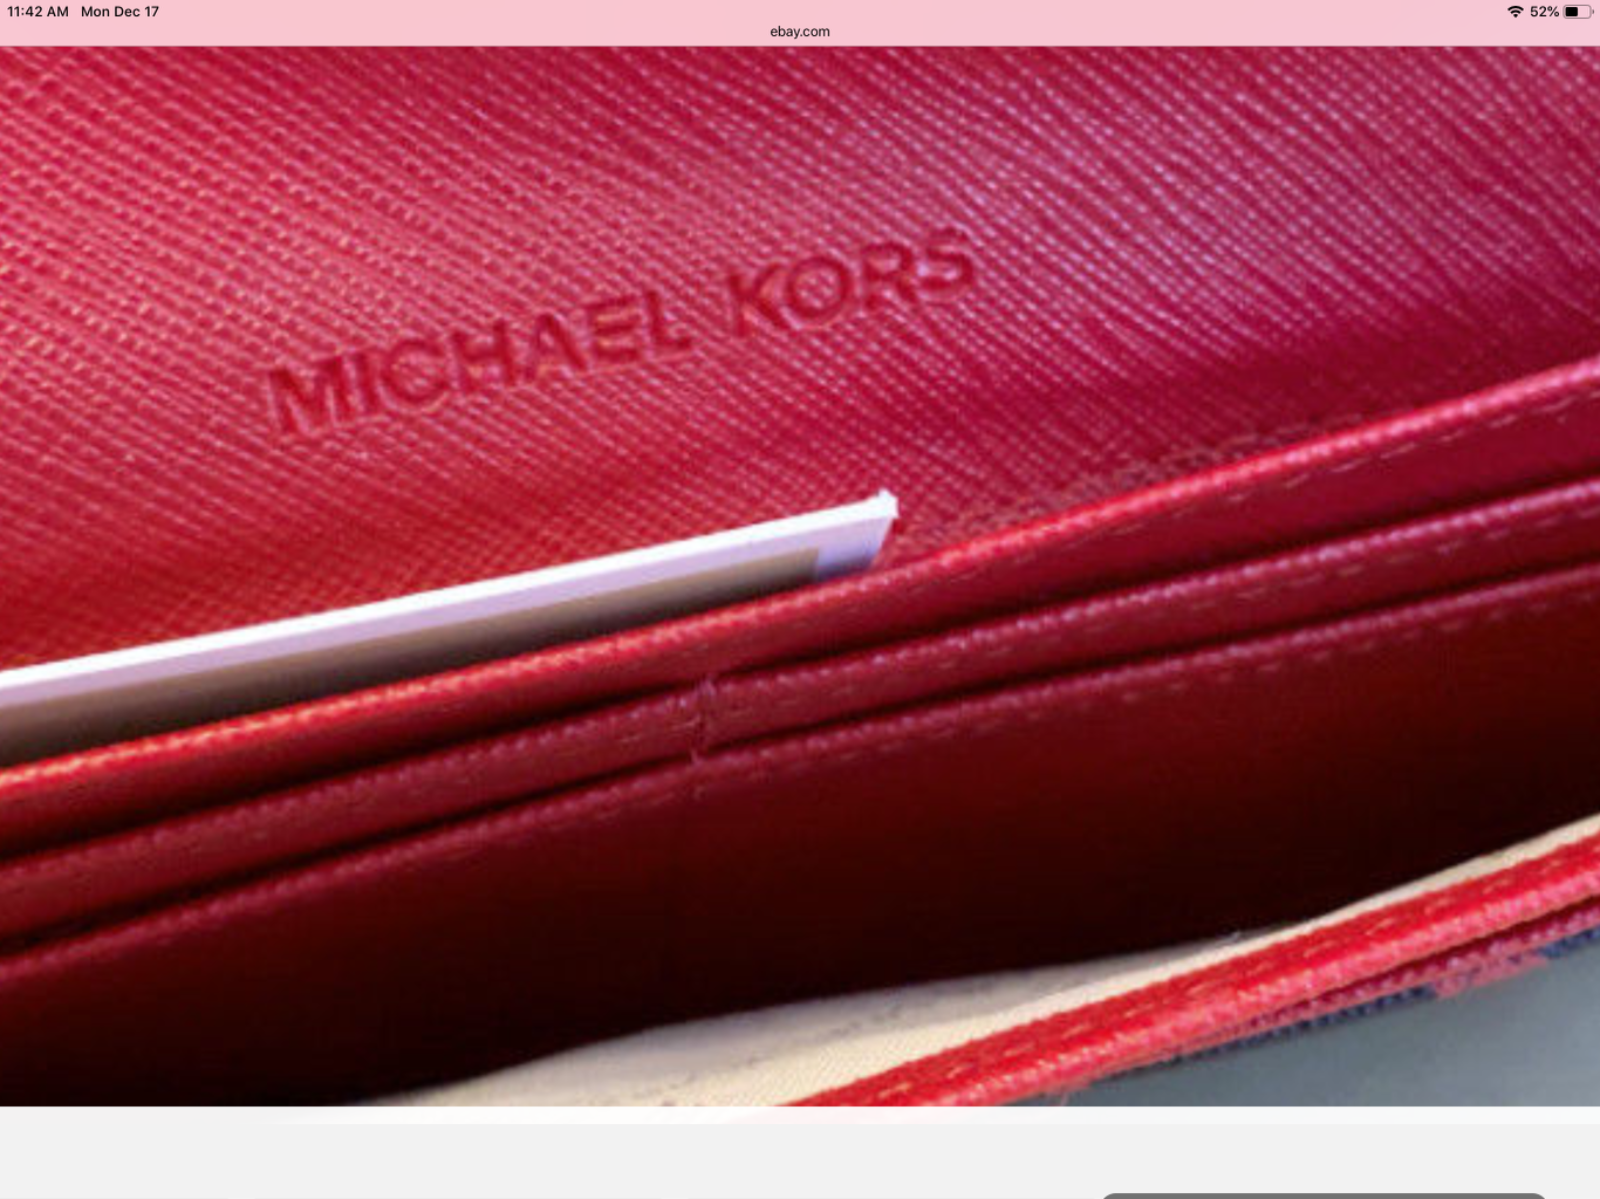 b3c62b9015c0 MICHAEL KORS JET SET TRAVEL PRINT SAFFIANO LEATHER BBLACK/RED FLAT WALLET